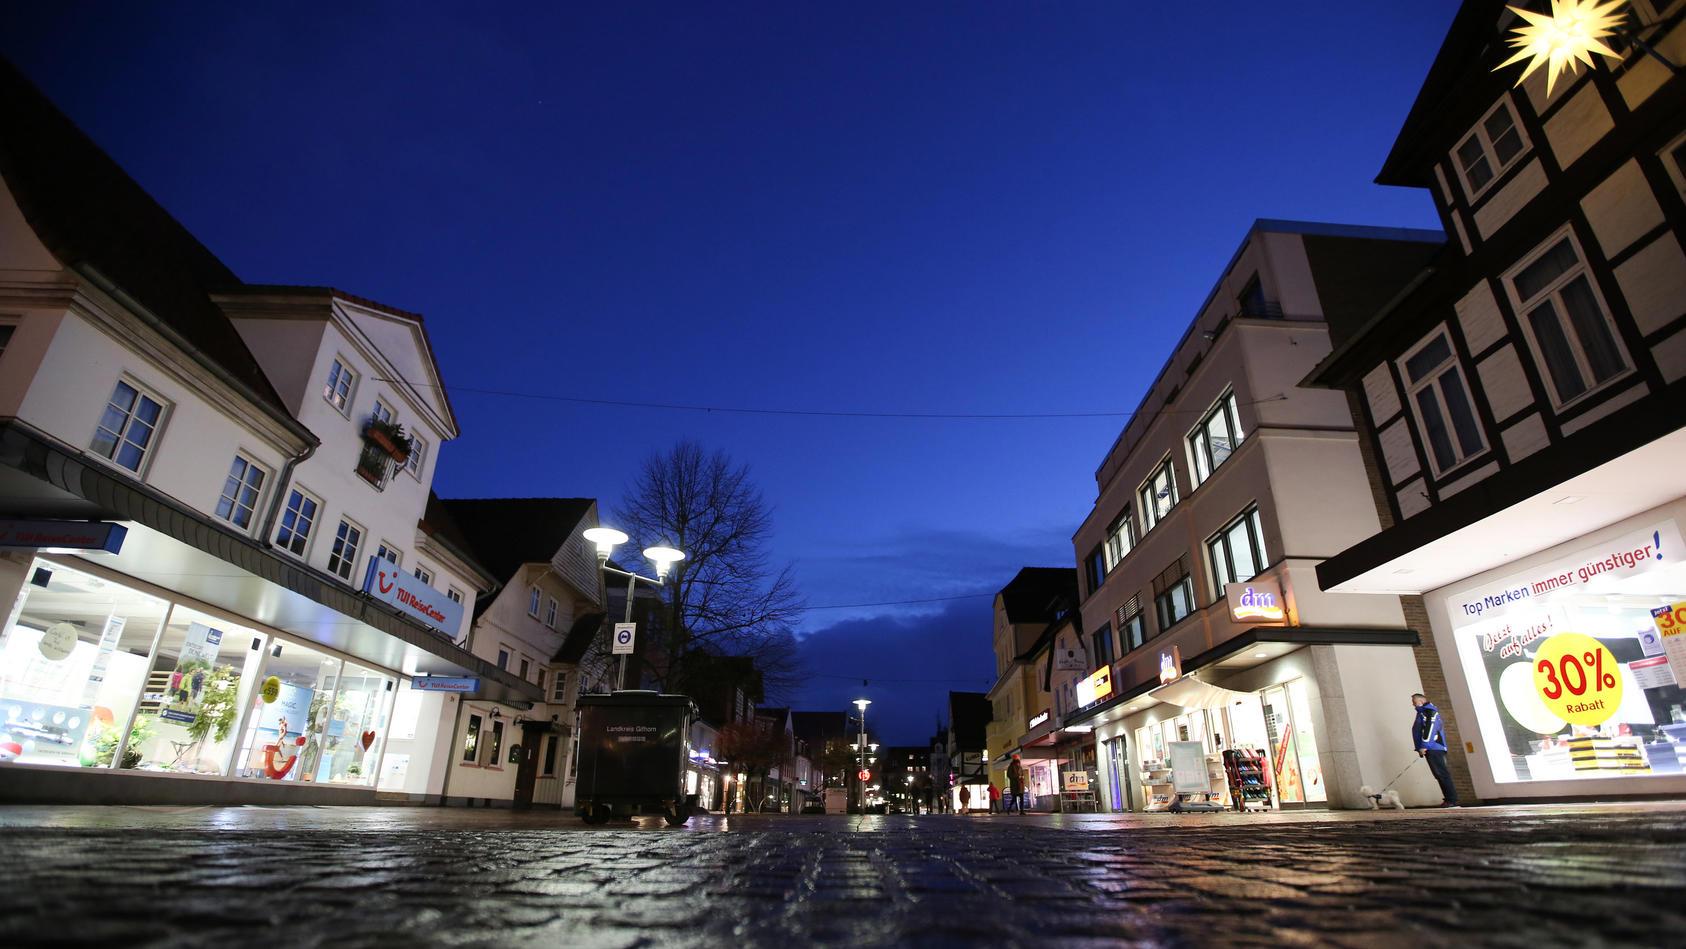 Landkreis Gifhorn hält an strengen Coronamaßnahmen fest.